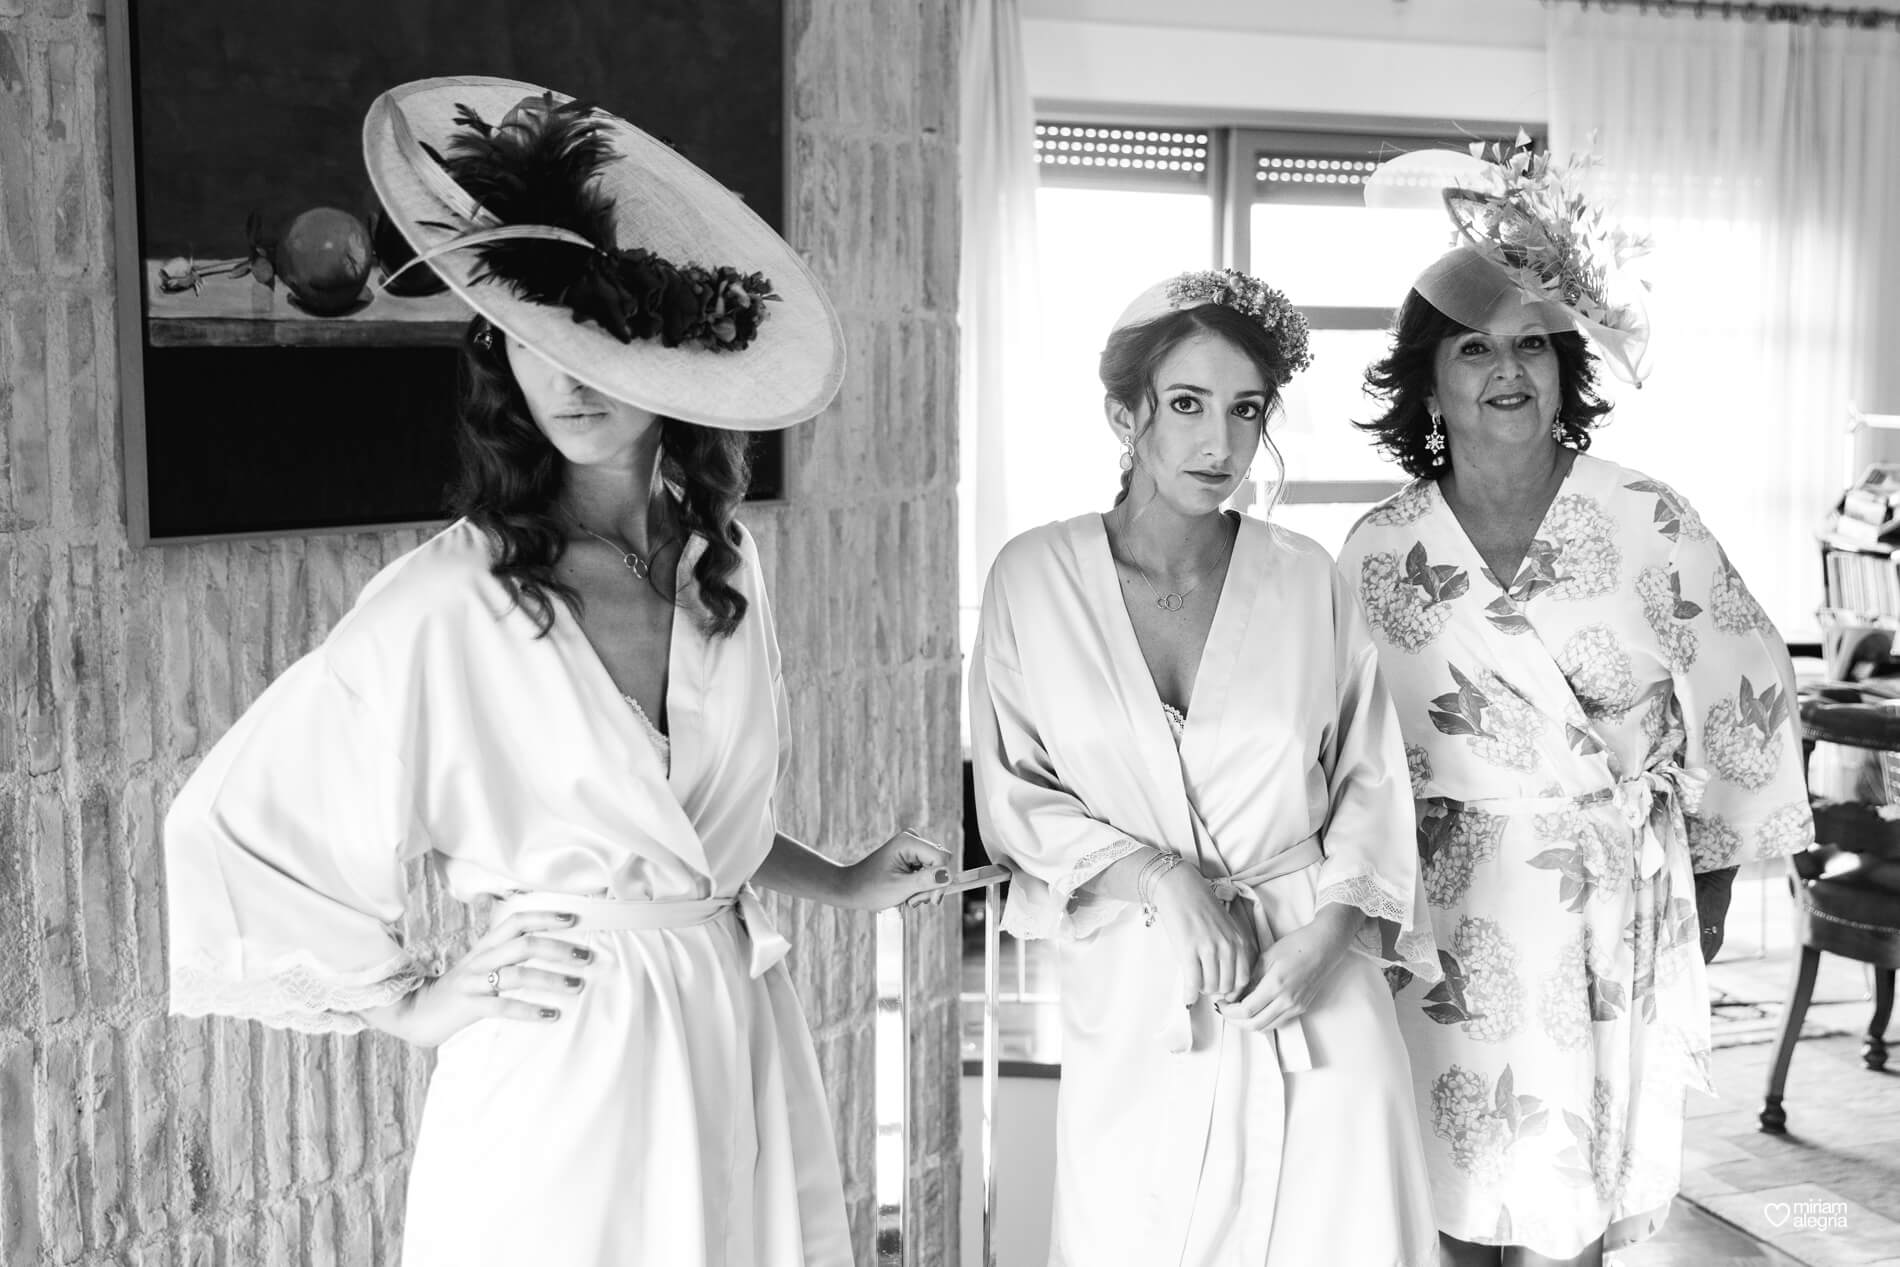 vestido-de-novia-paula-del-vas-miriam-alegria-fotografos-boda-murcia-16